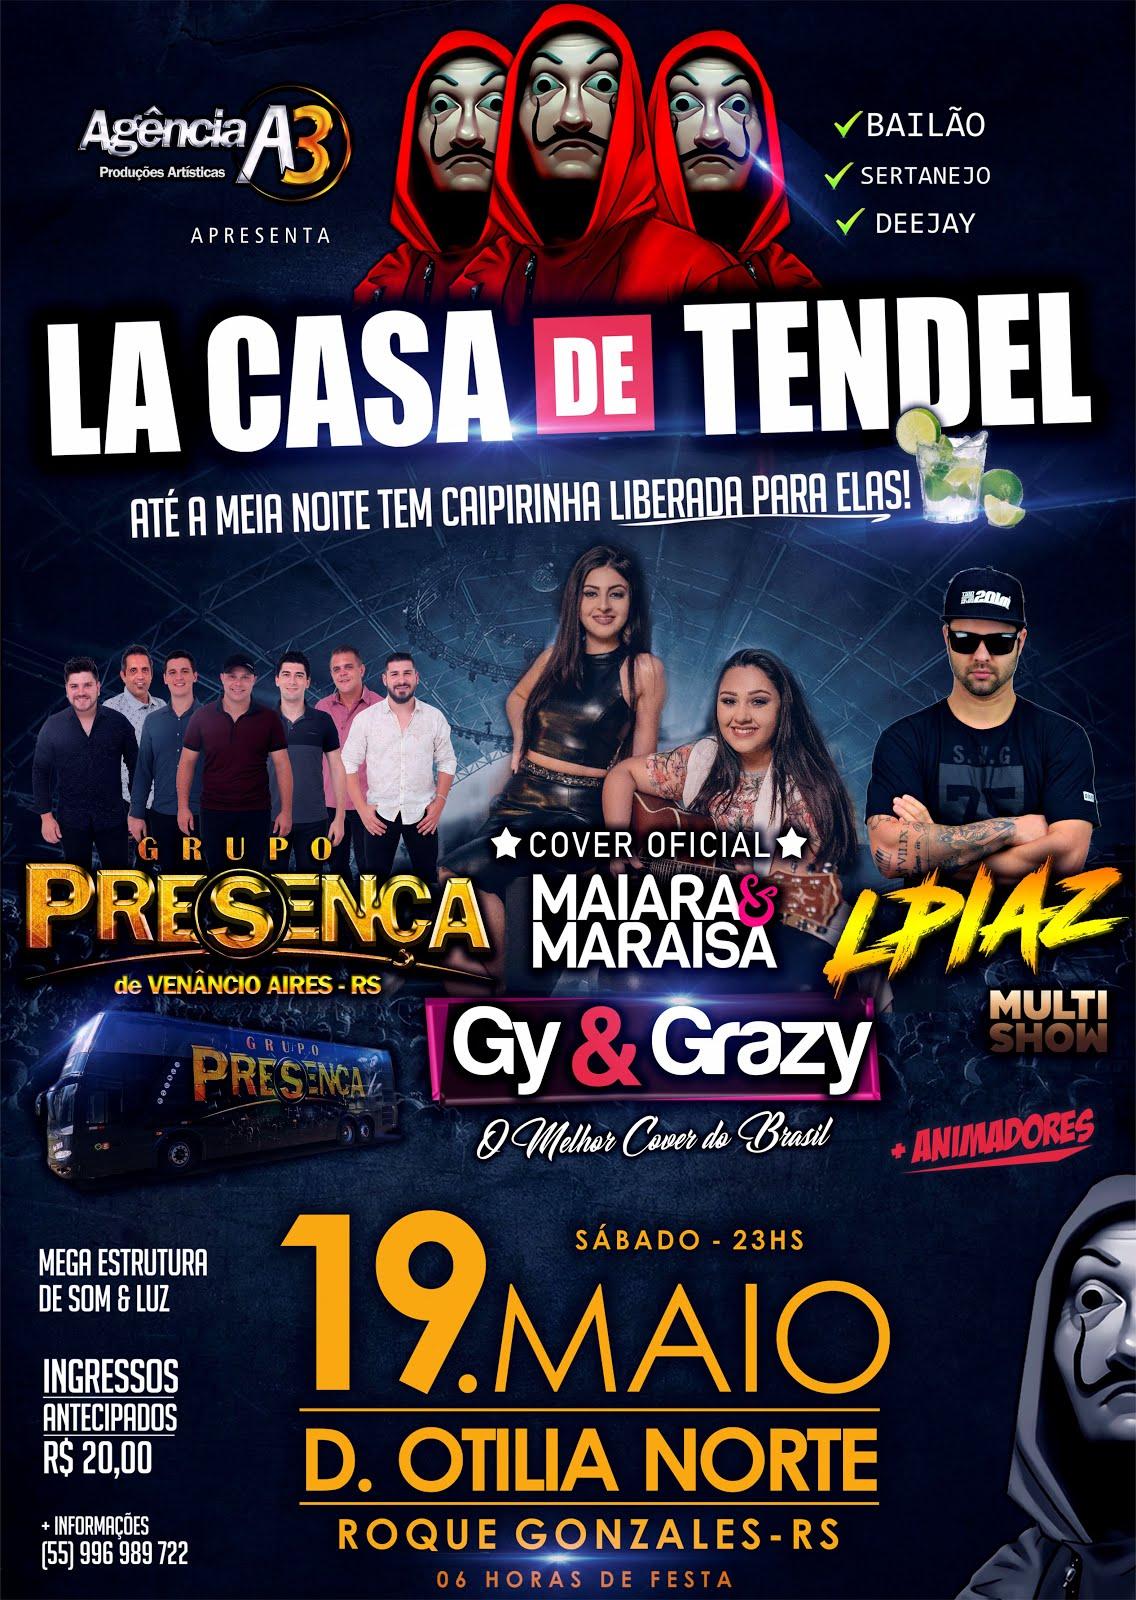 19/05 - LA CASA DE TENDEL